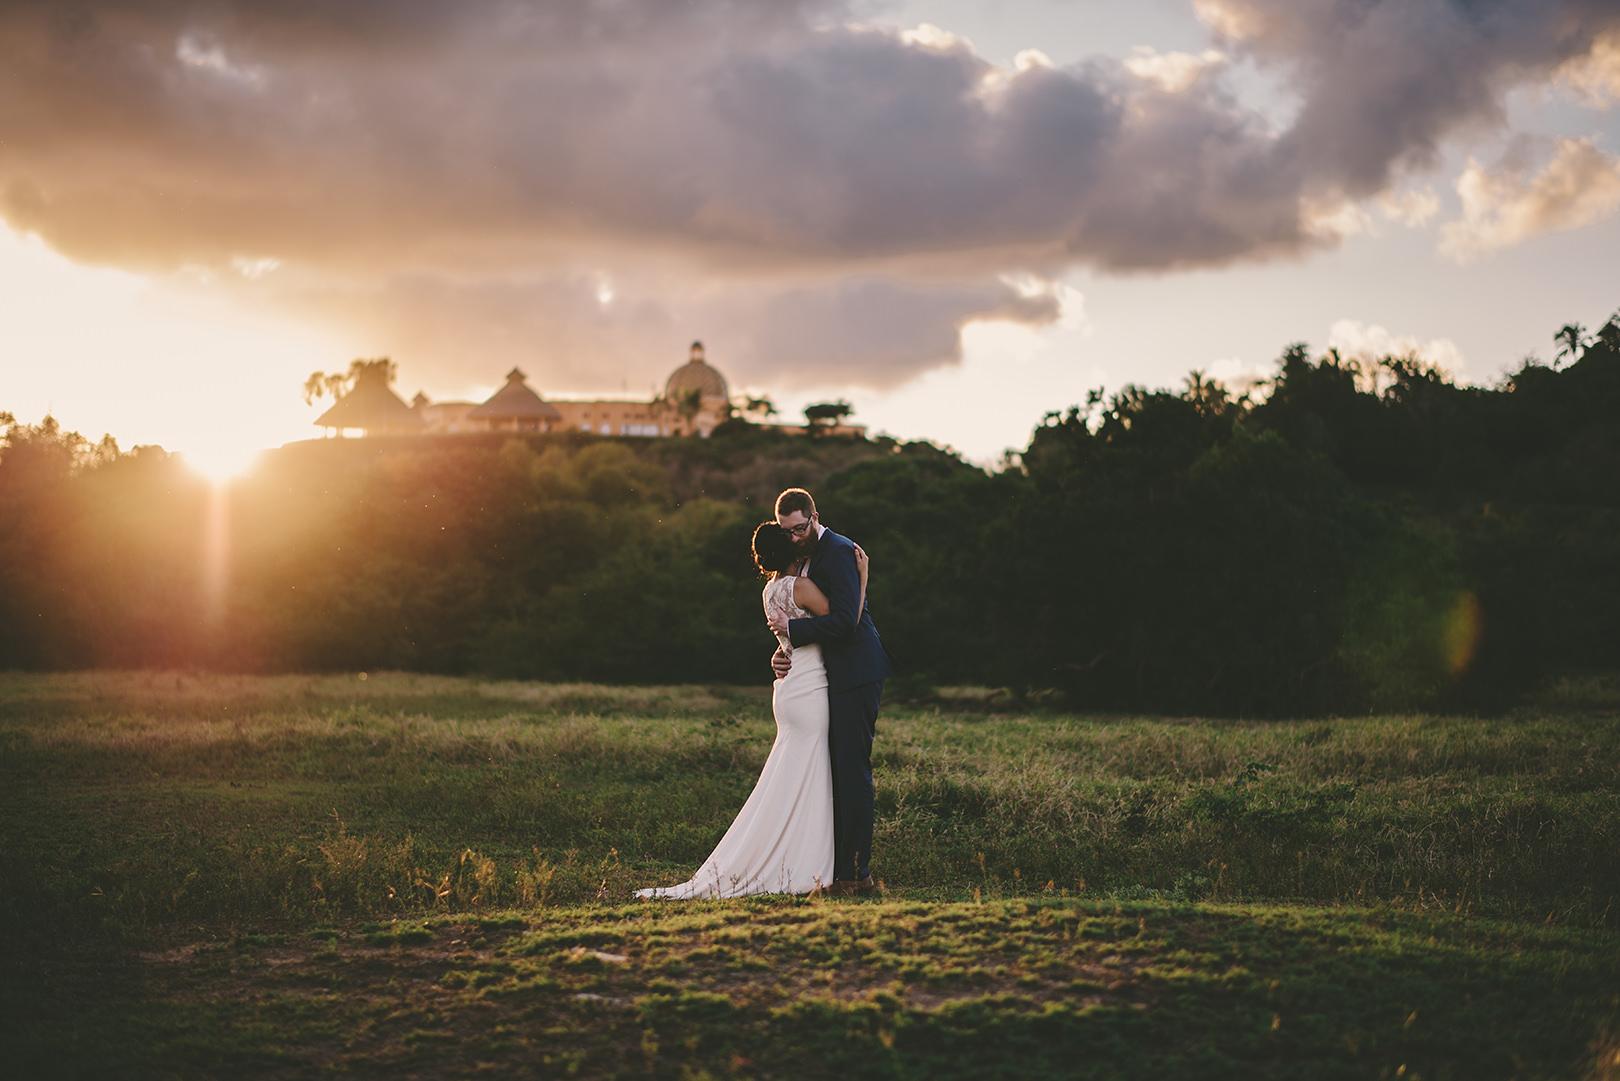 Spain Wedding Photographer - © Dallas Kolotylo Photography - 065